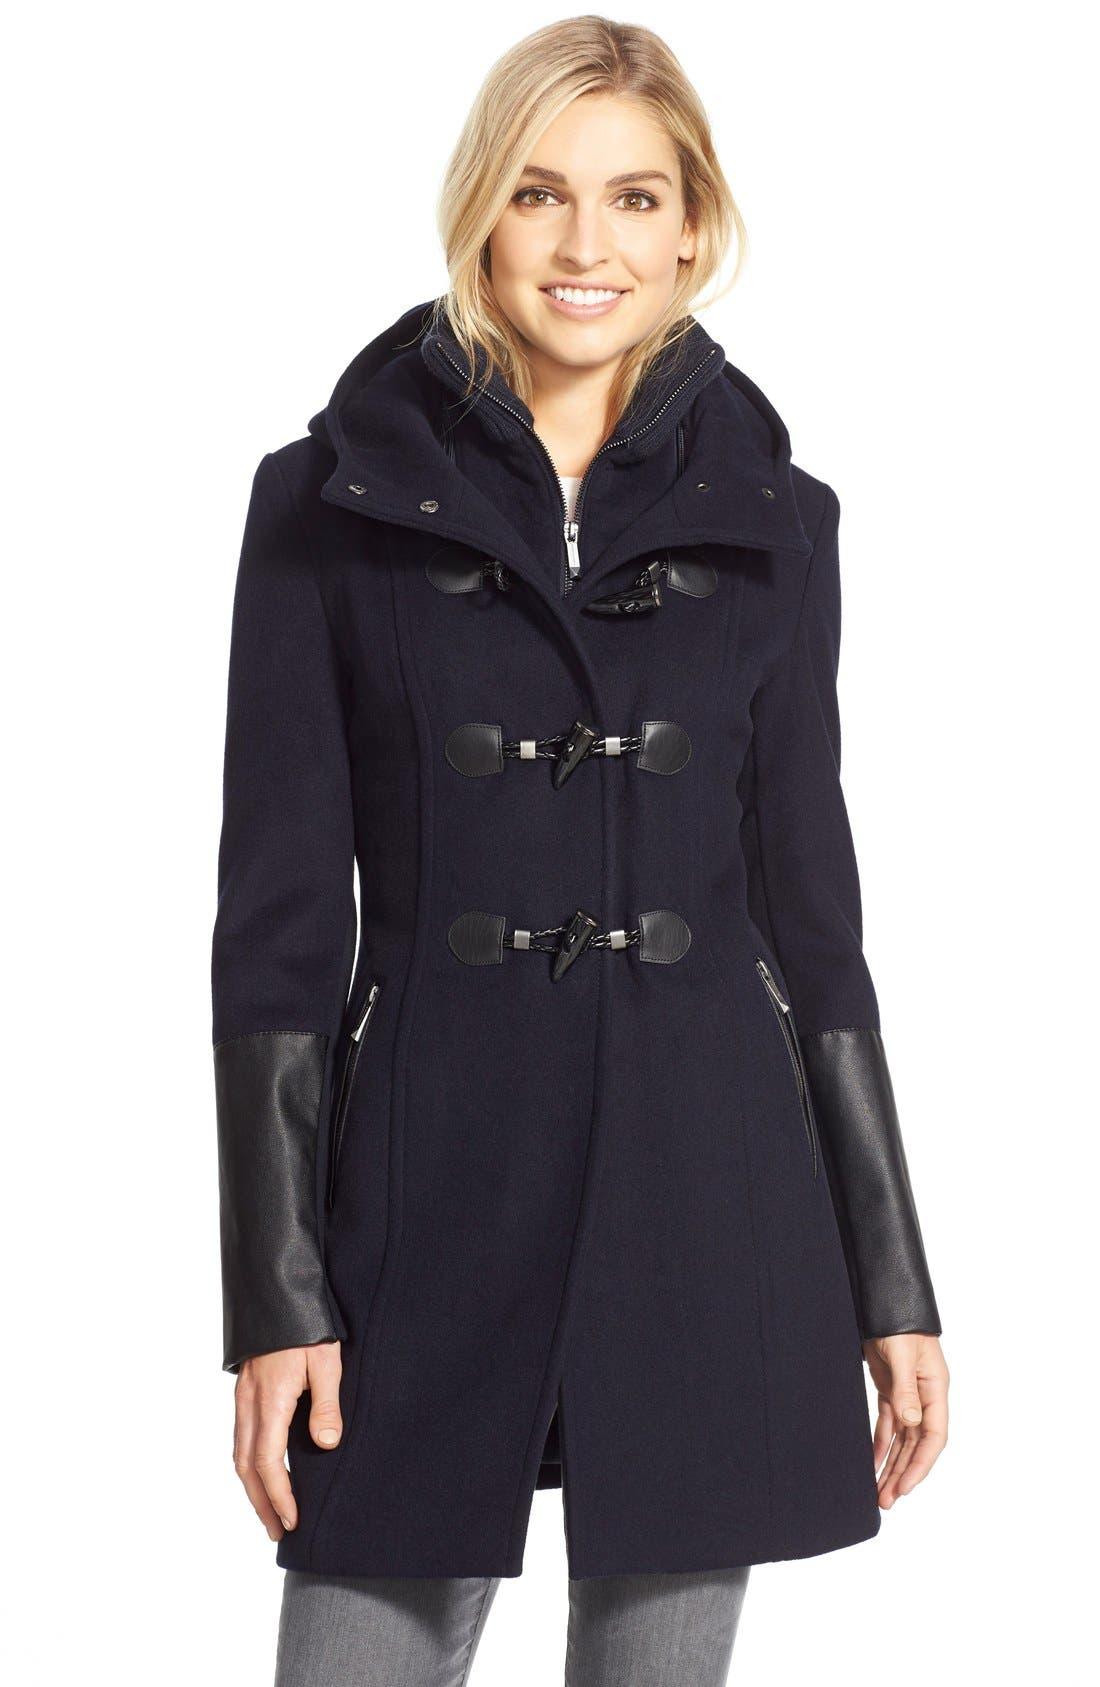 Main Image - BCBGMAXAZRIA Faux Leather Trim Wool Blend Duffle Coat with Inset Bib